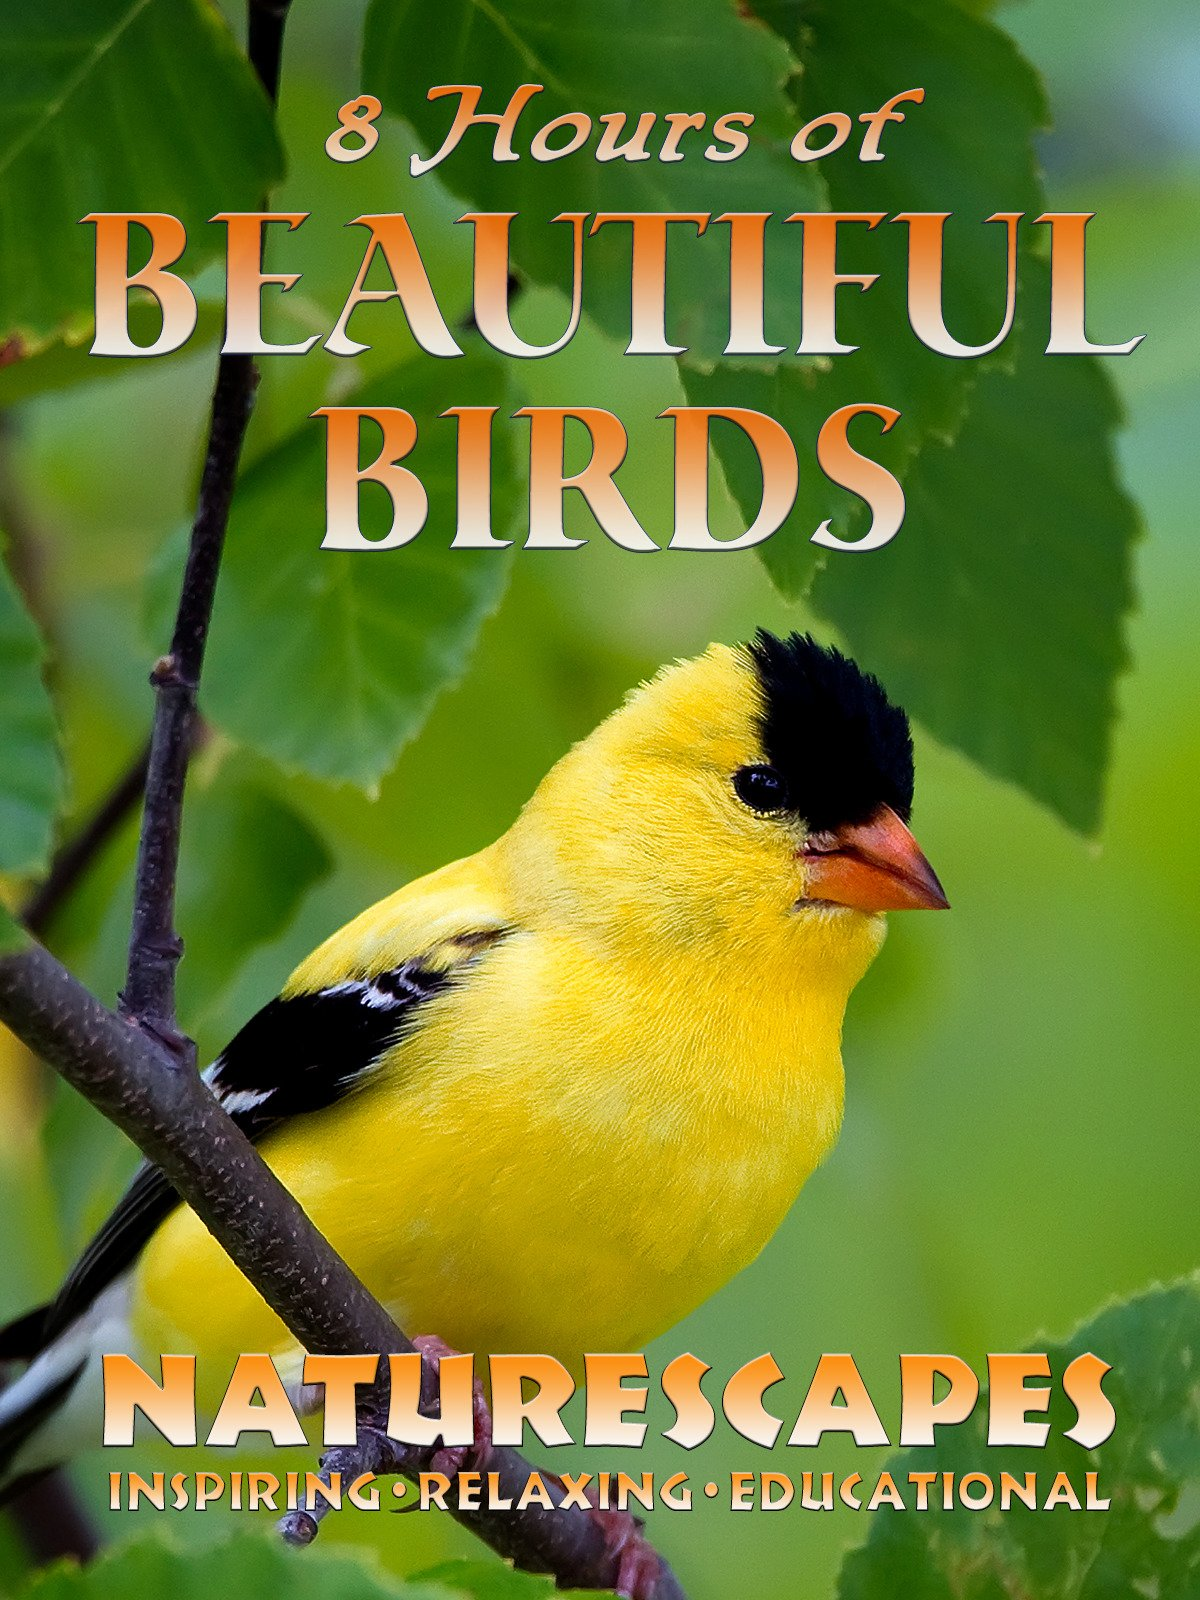 8 Hours of Beautiful Birds